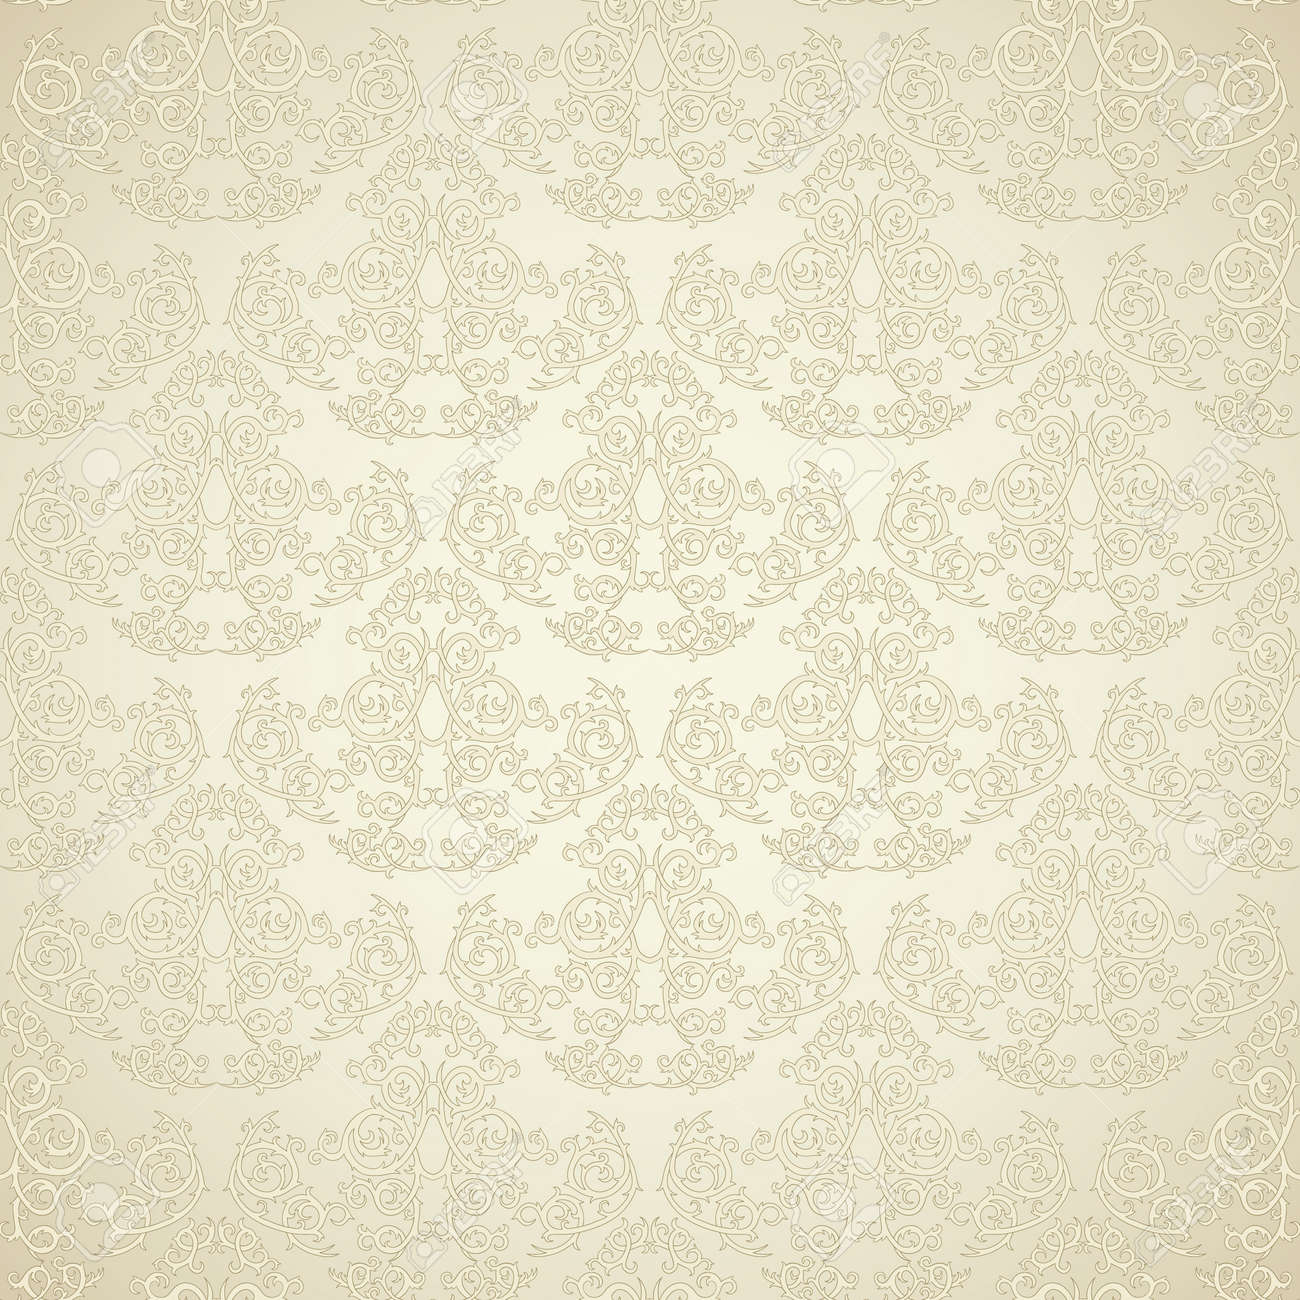 Damask seamless wallpaper on beige  background. Stylish and luxuryz Stock Vector - 11964899